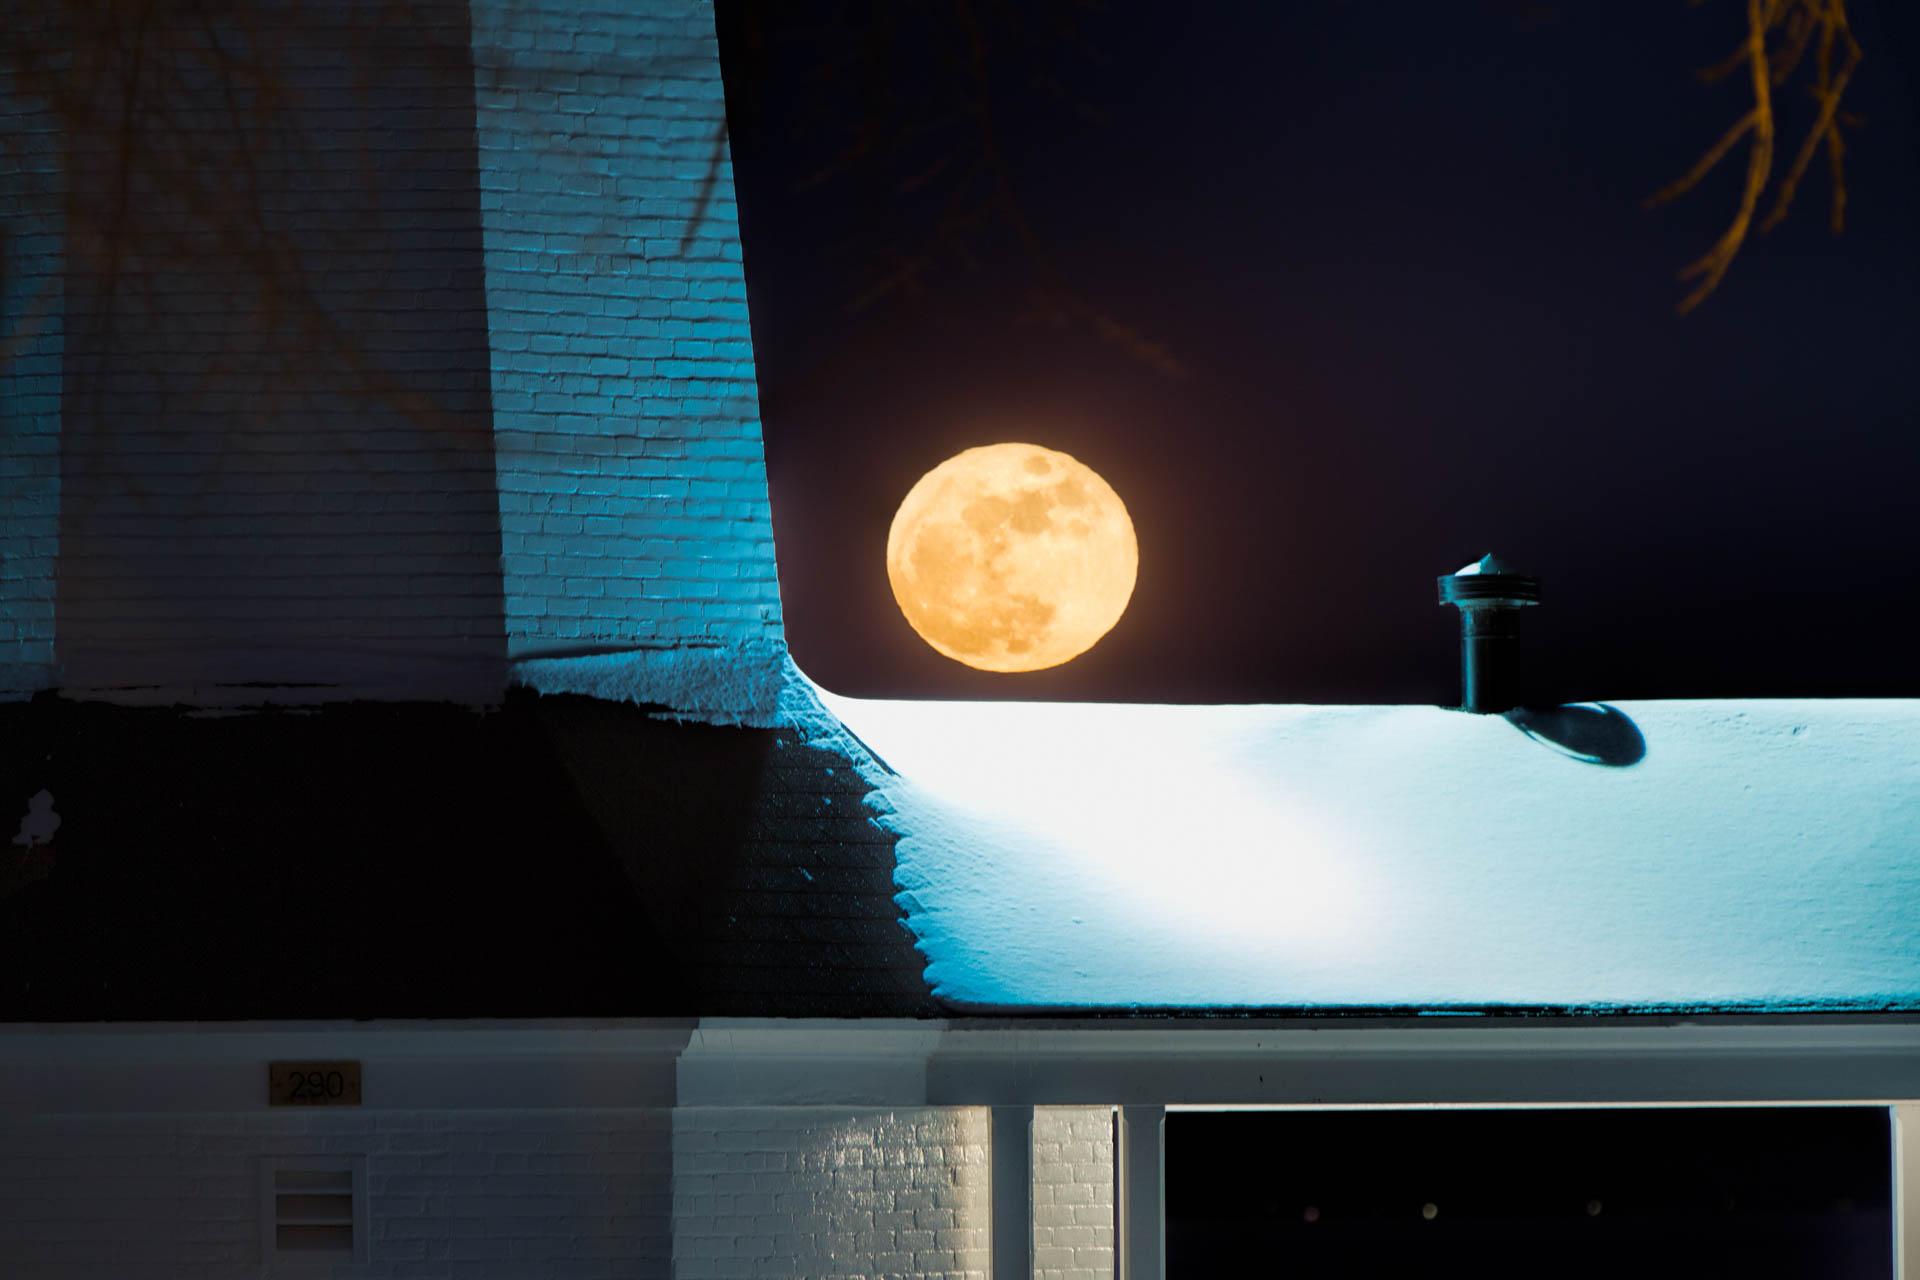 First Full Moon of Winter II